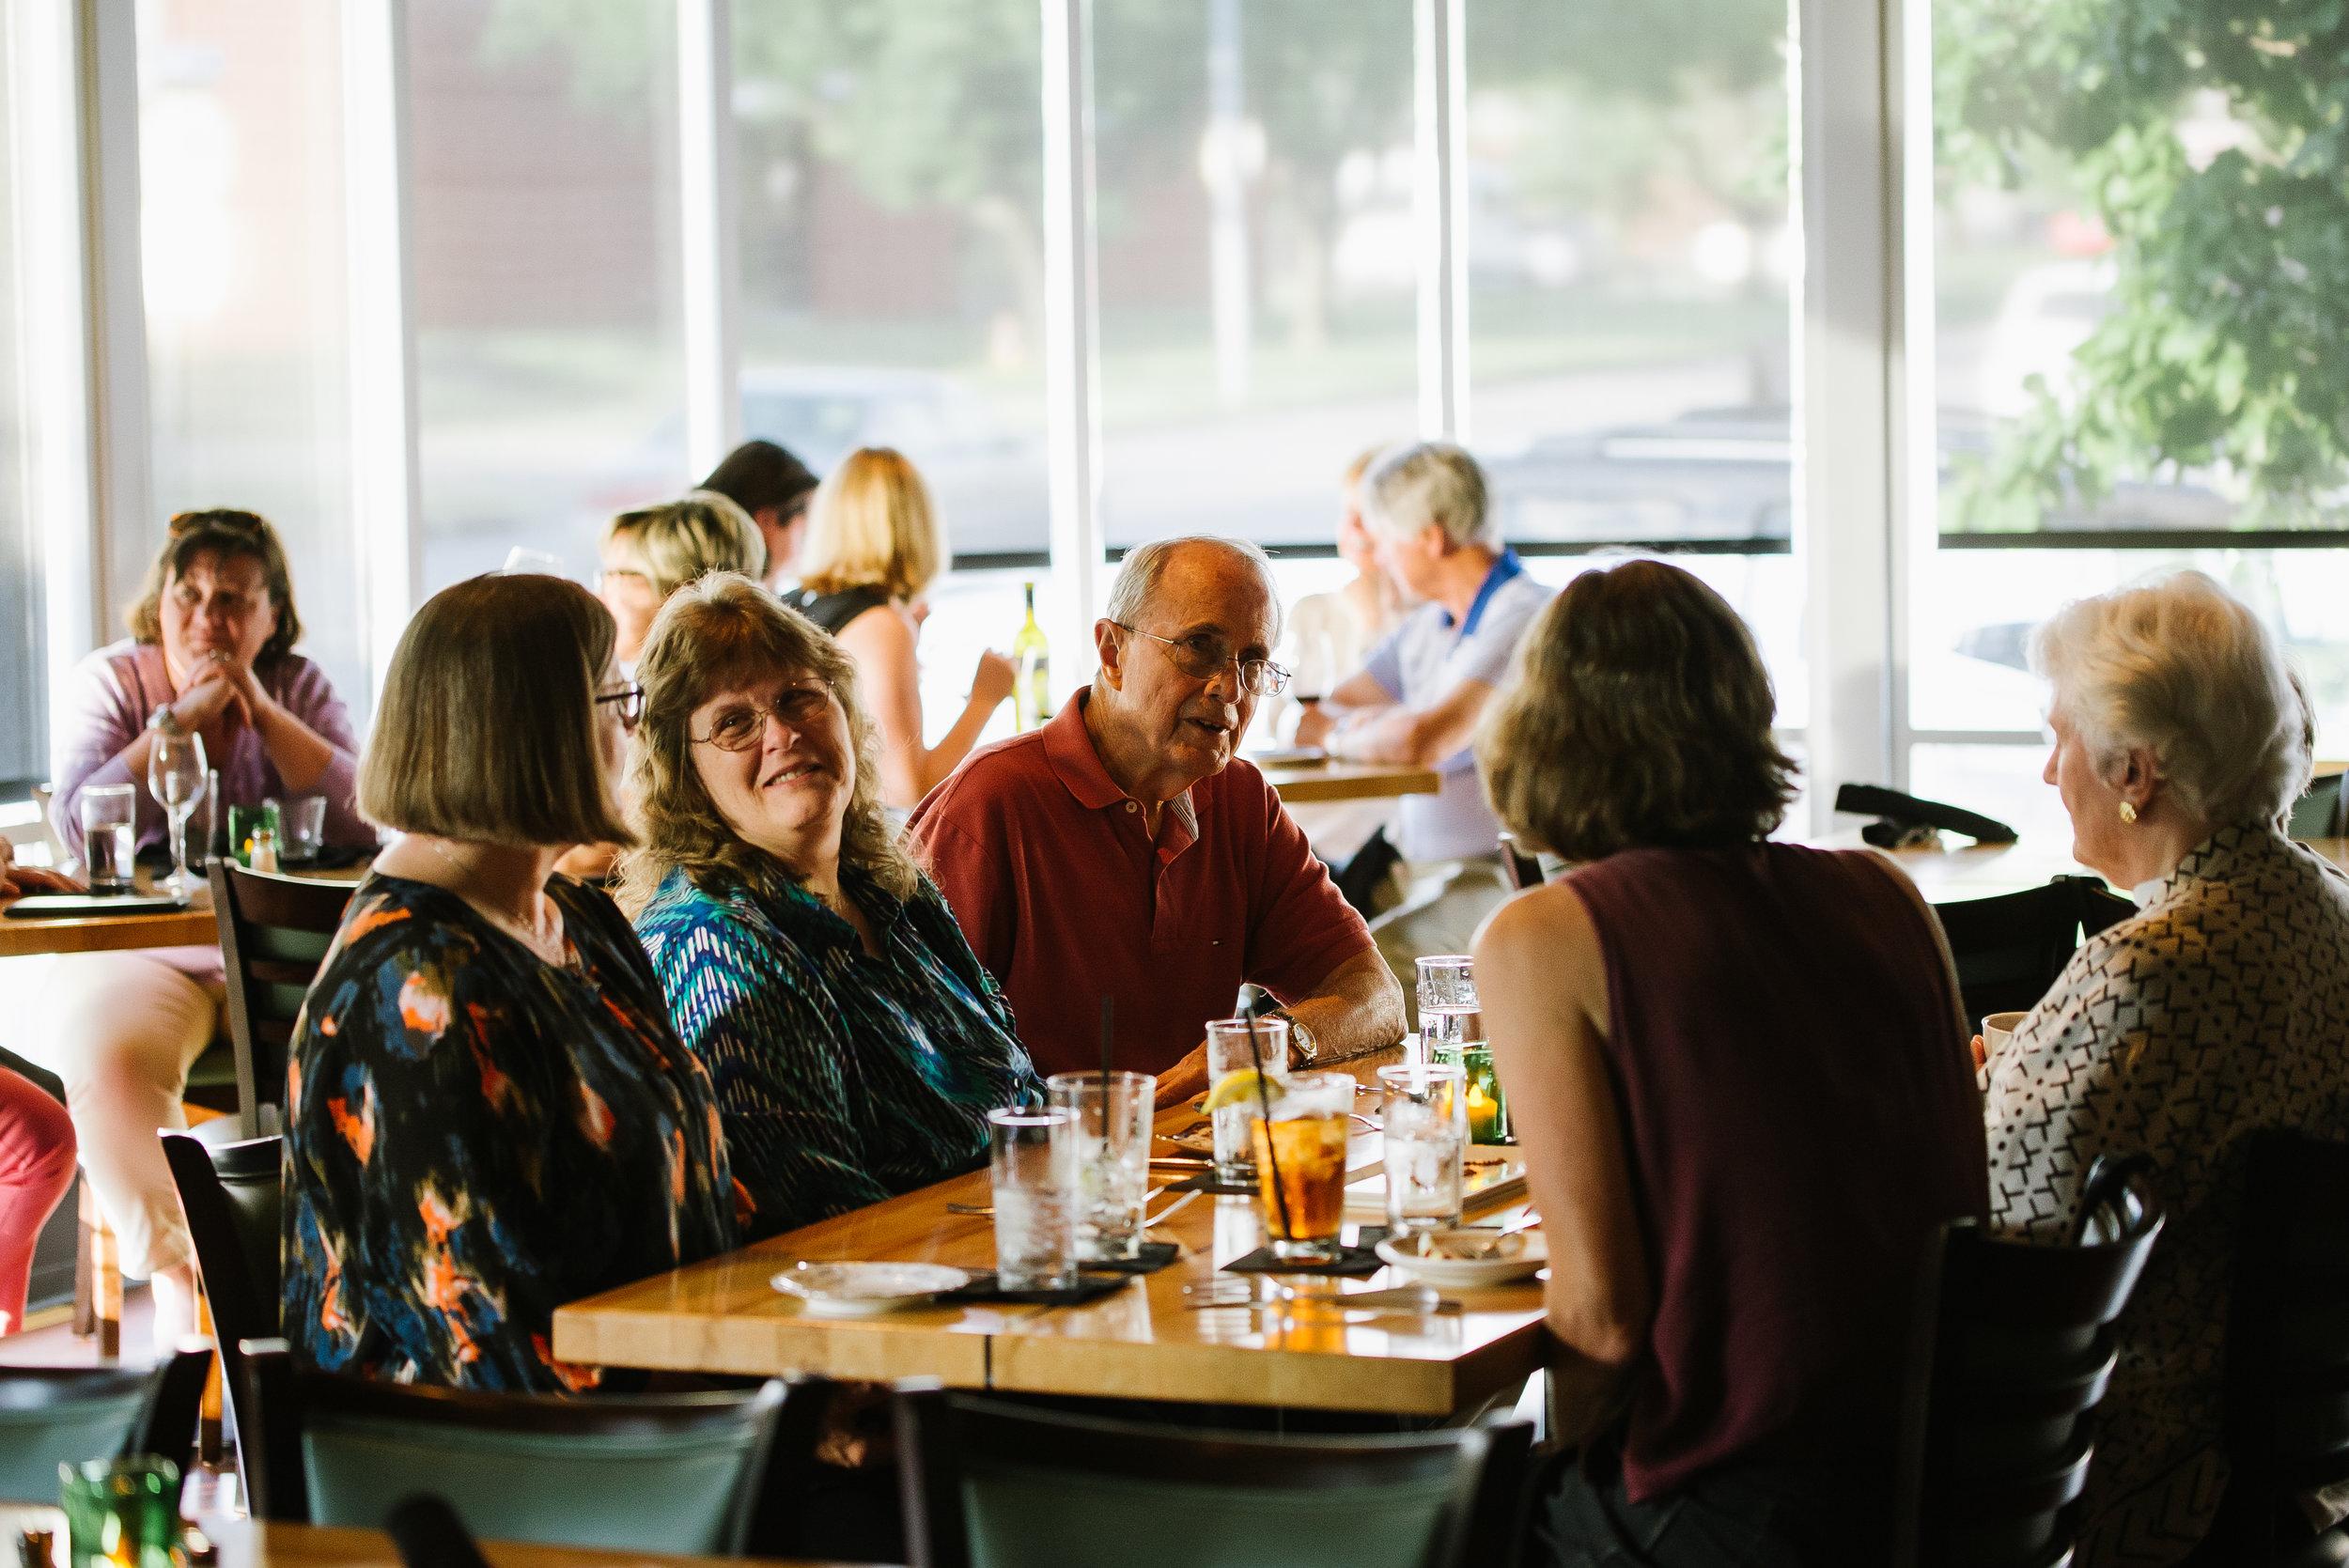 Alba Des Moines, Iowa Restaurant Table 6